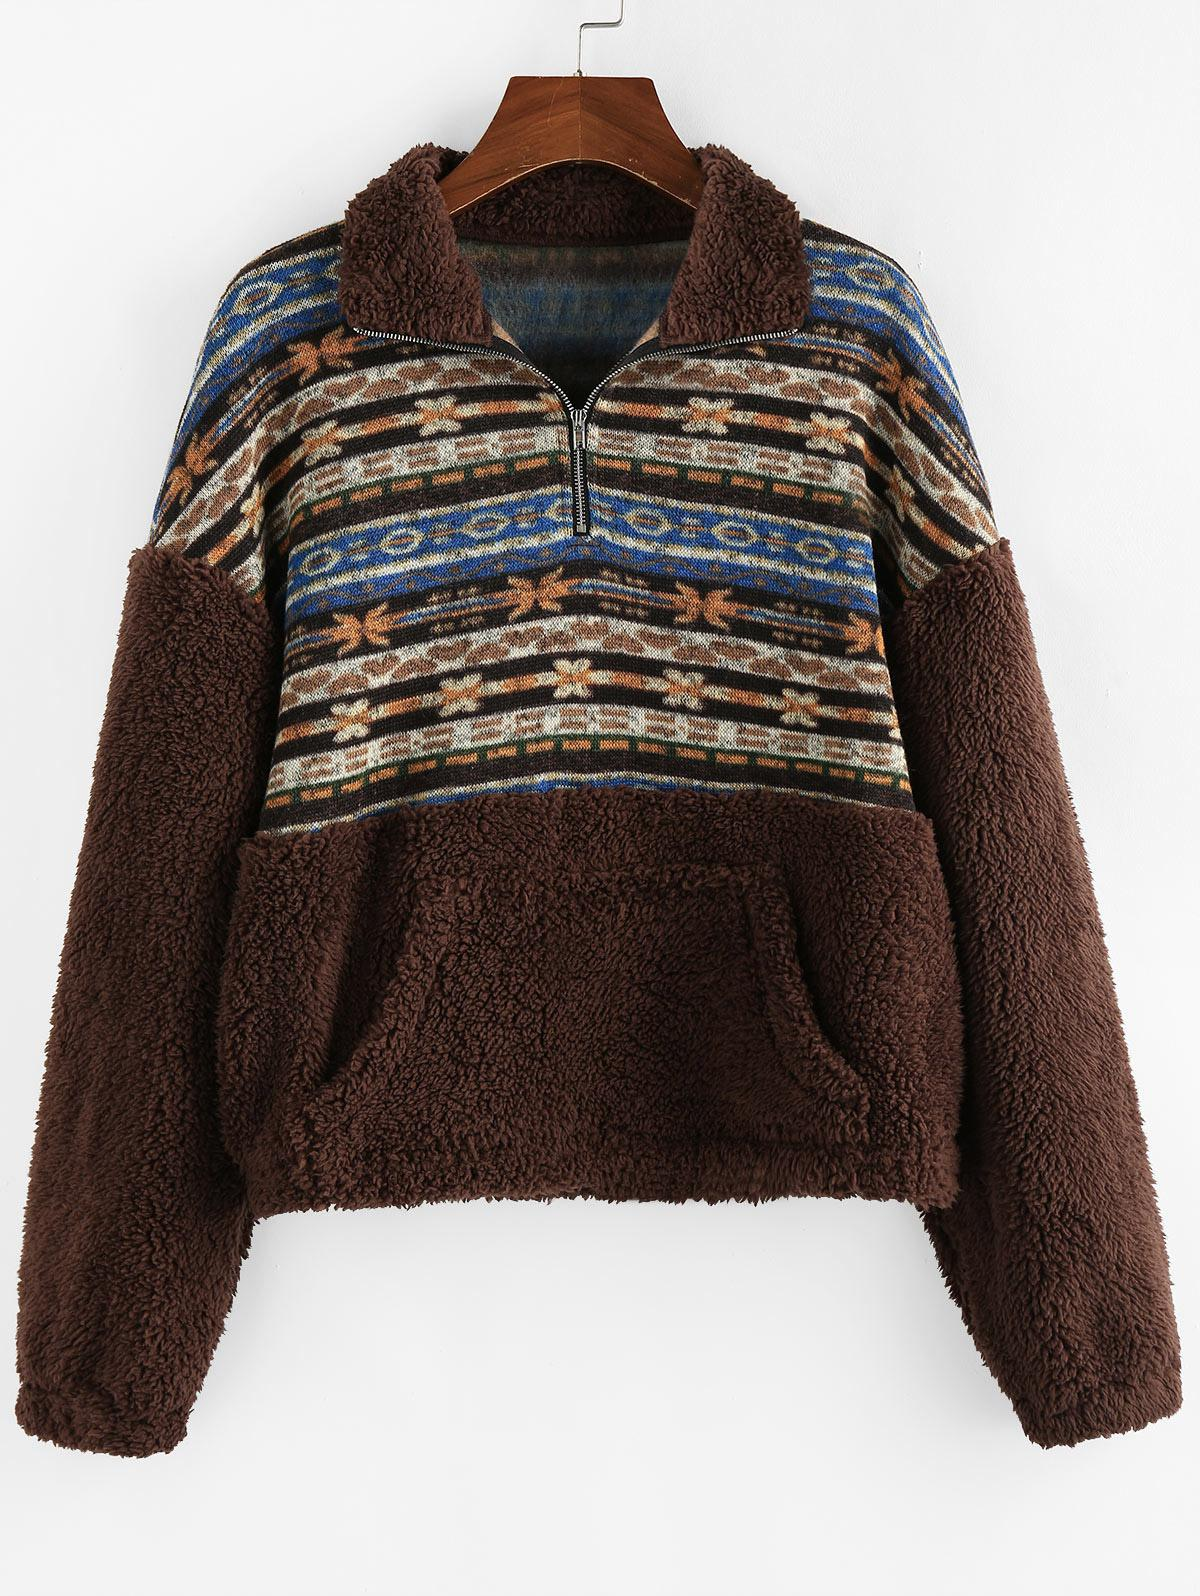 Sweat-shirt Zippé Ethnique Fleuri Imprimé - ZAFUL - Modalova